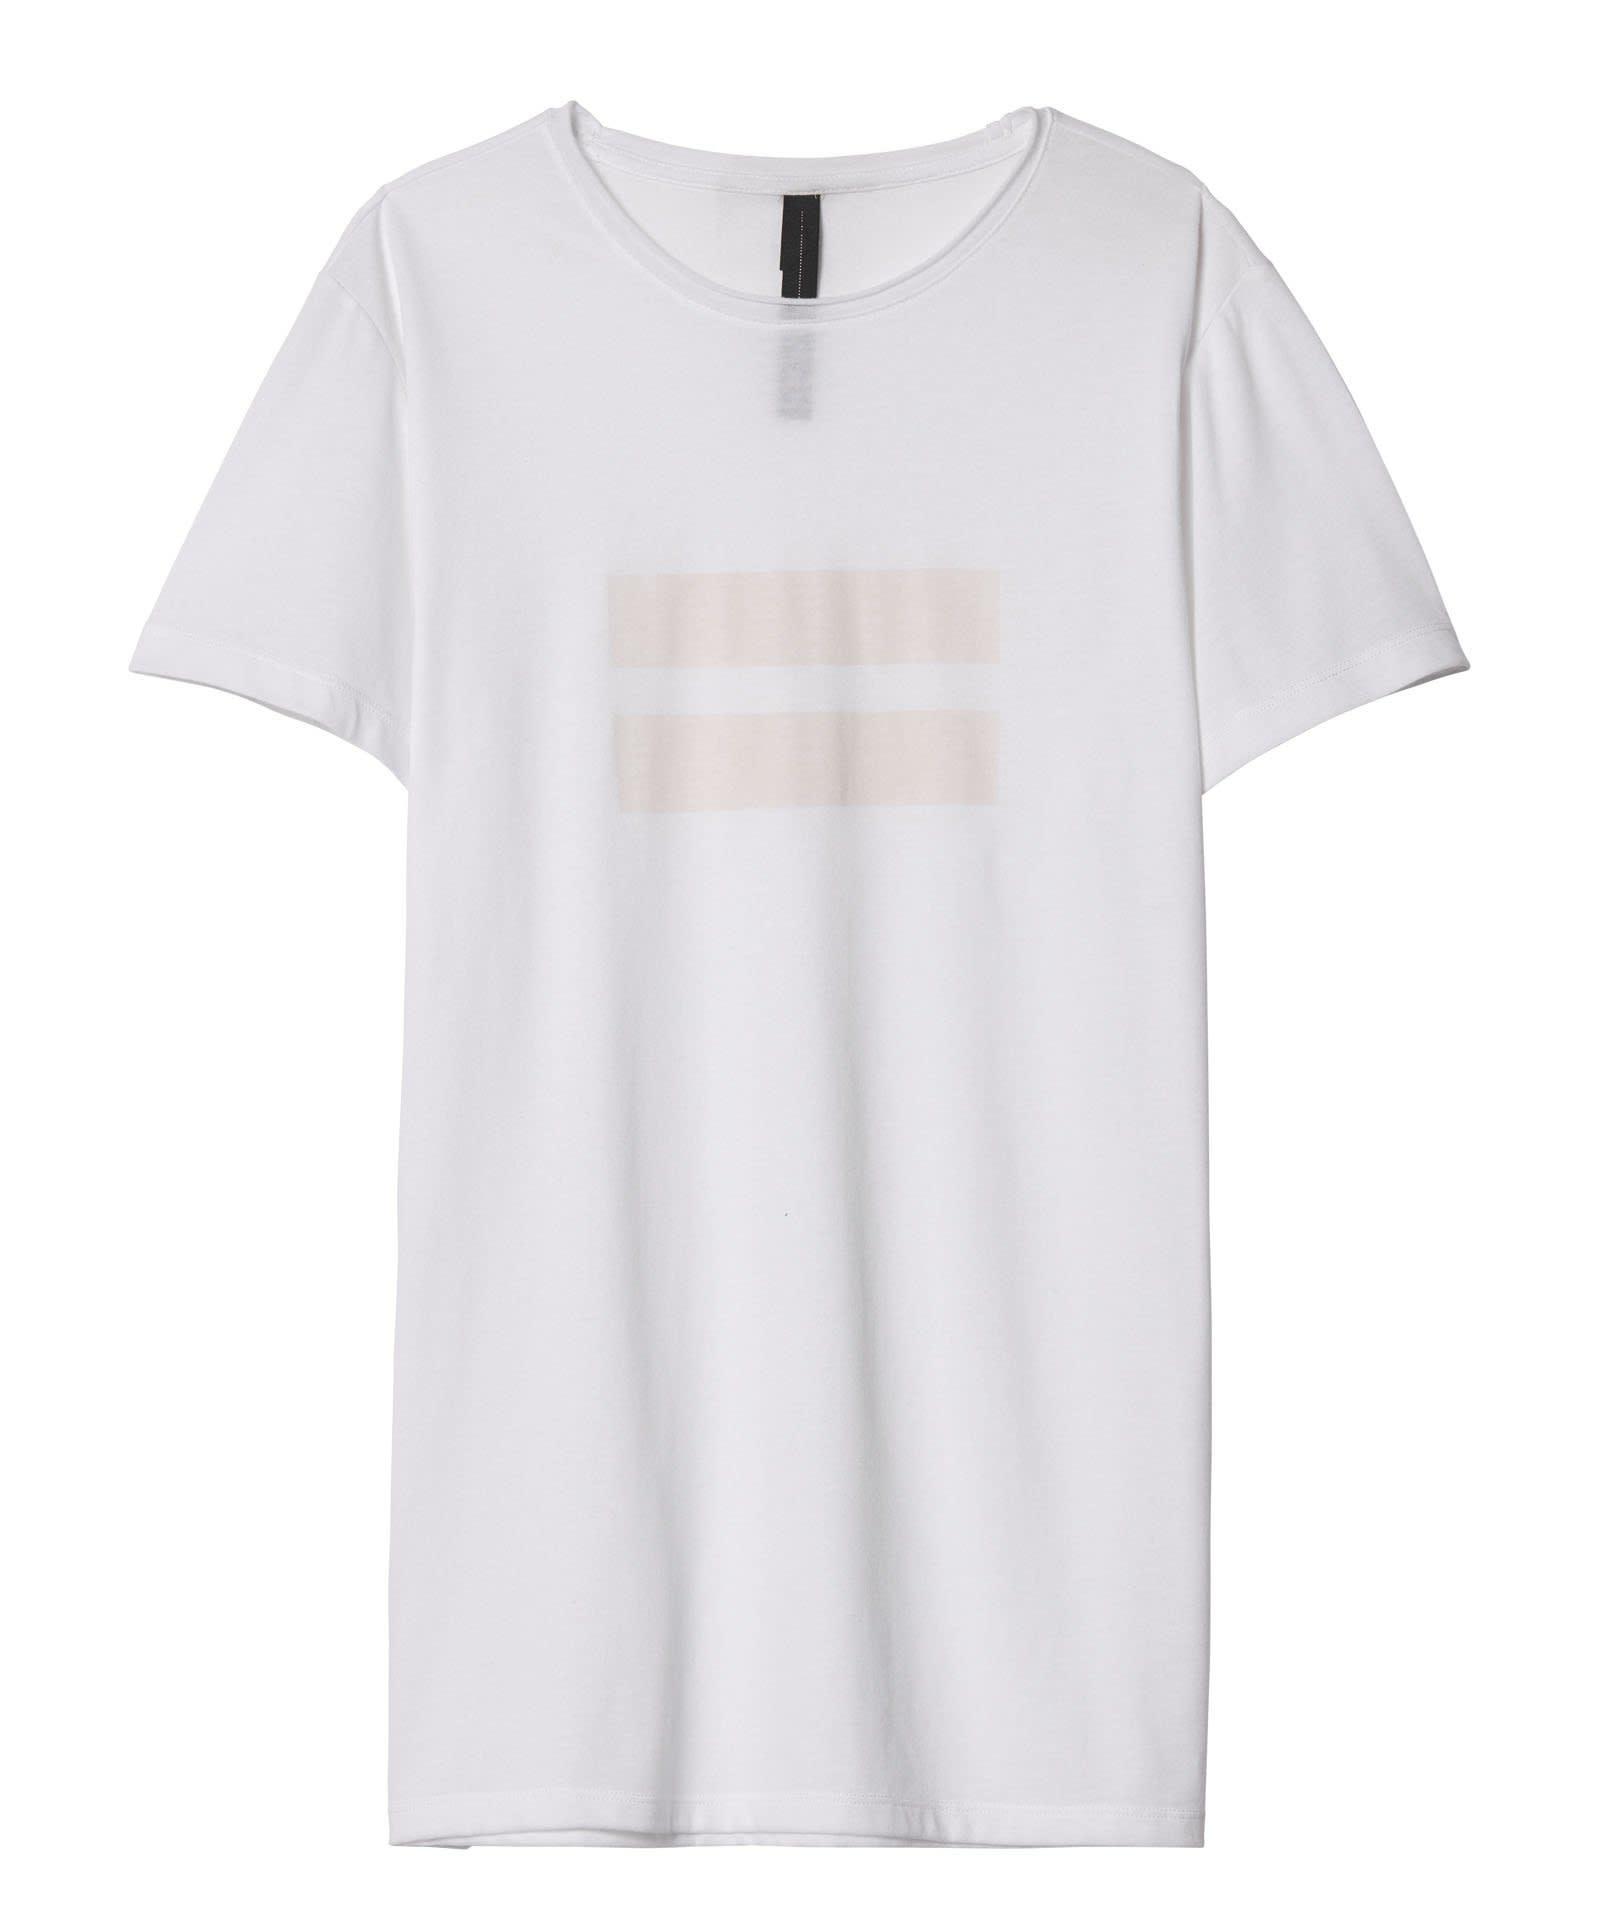 T-shirt tee two stripes-1